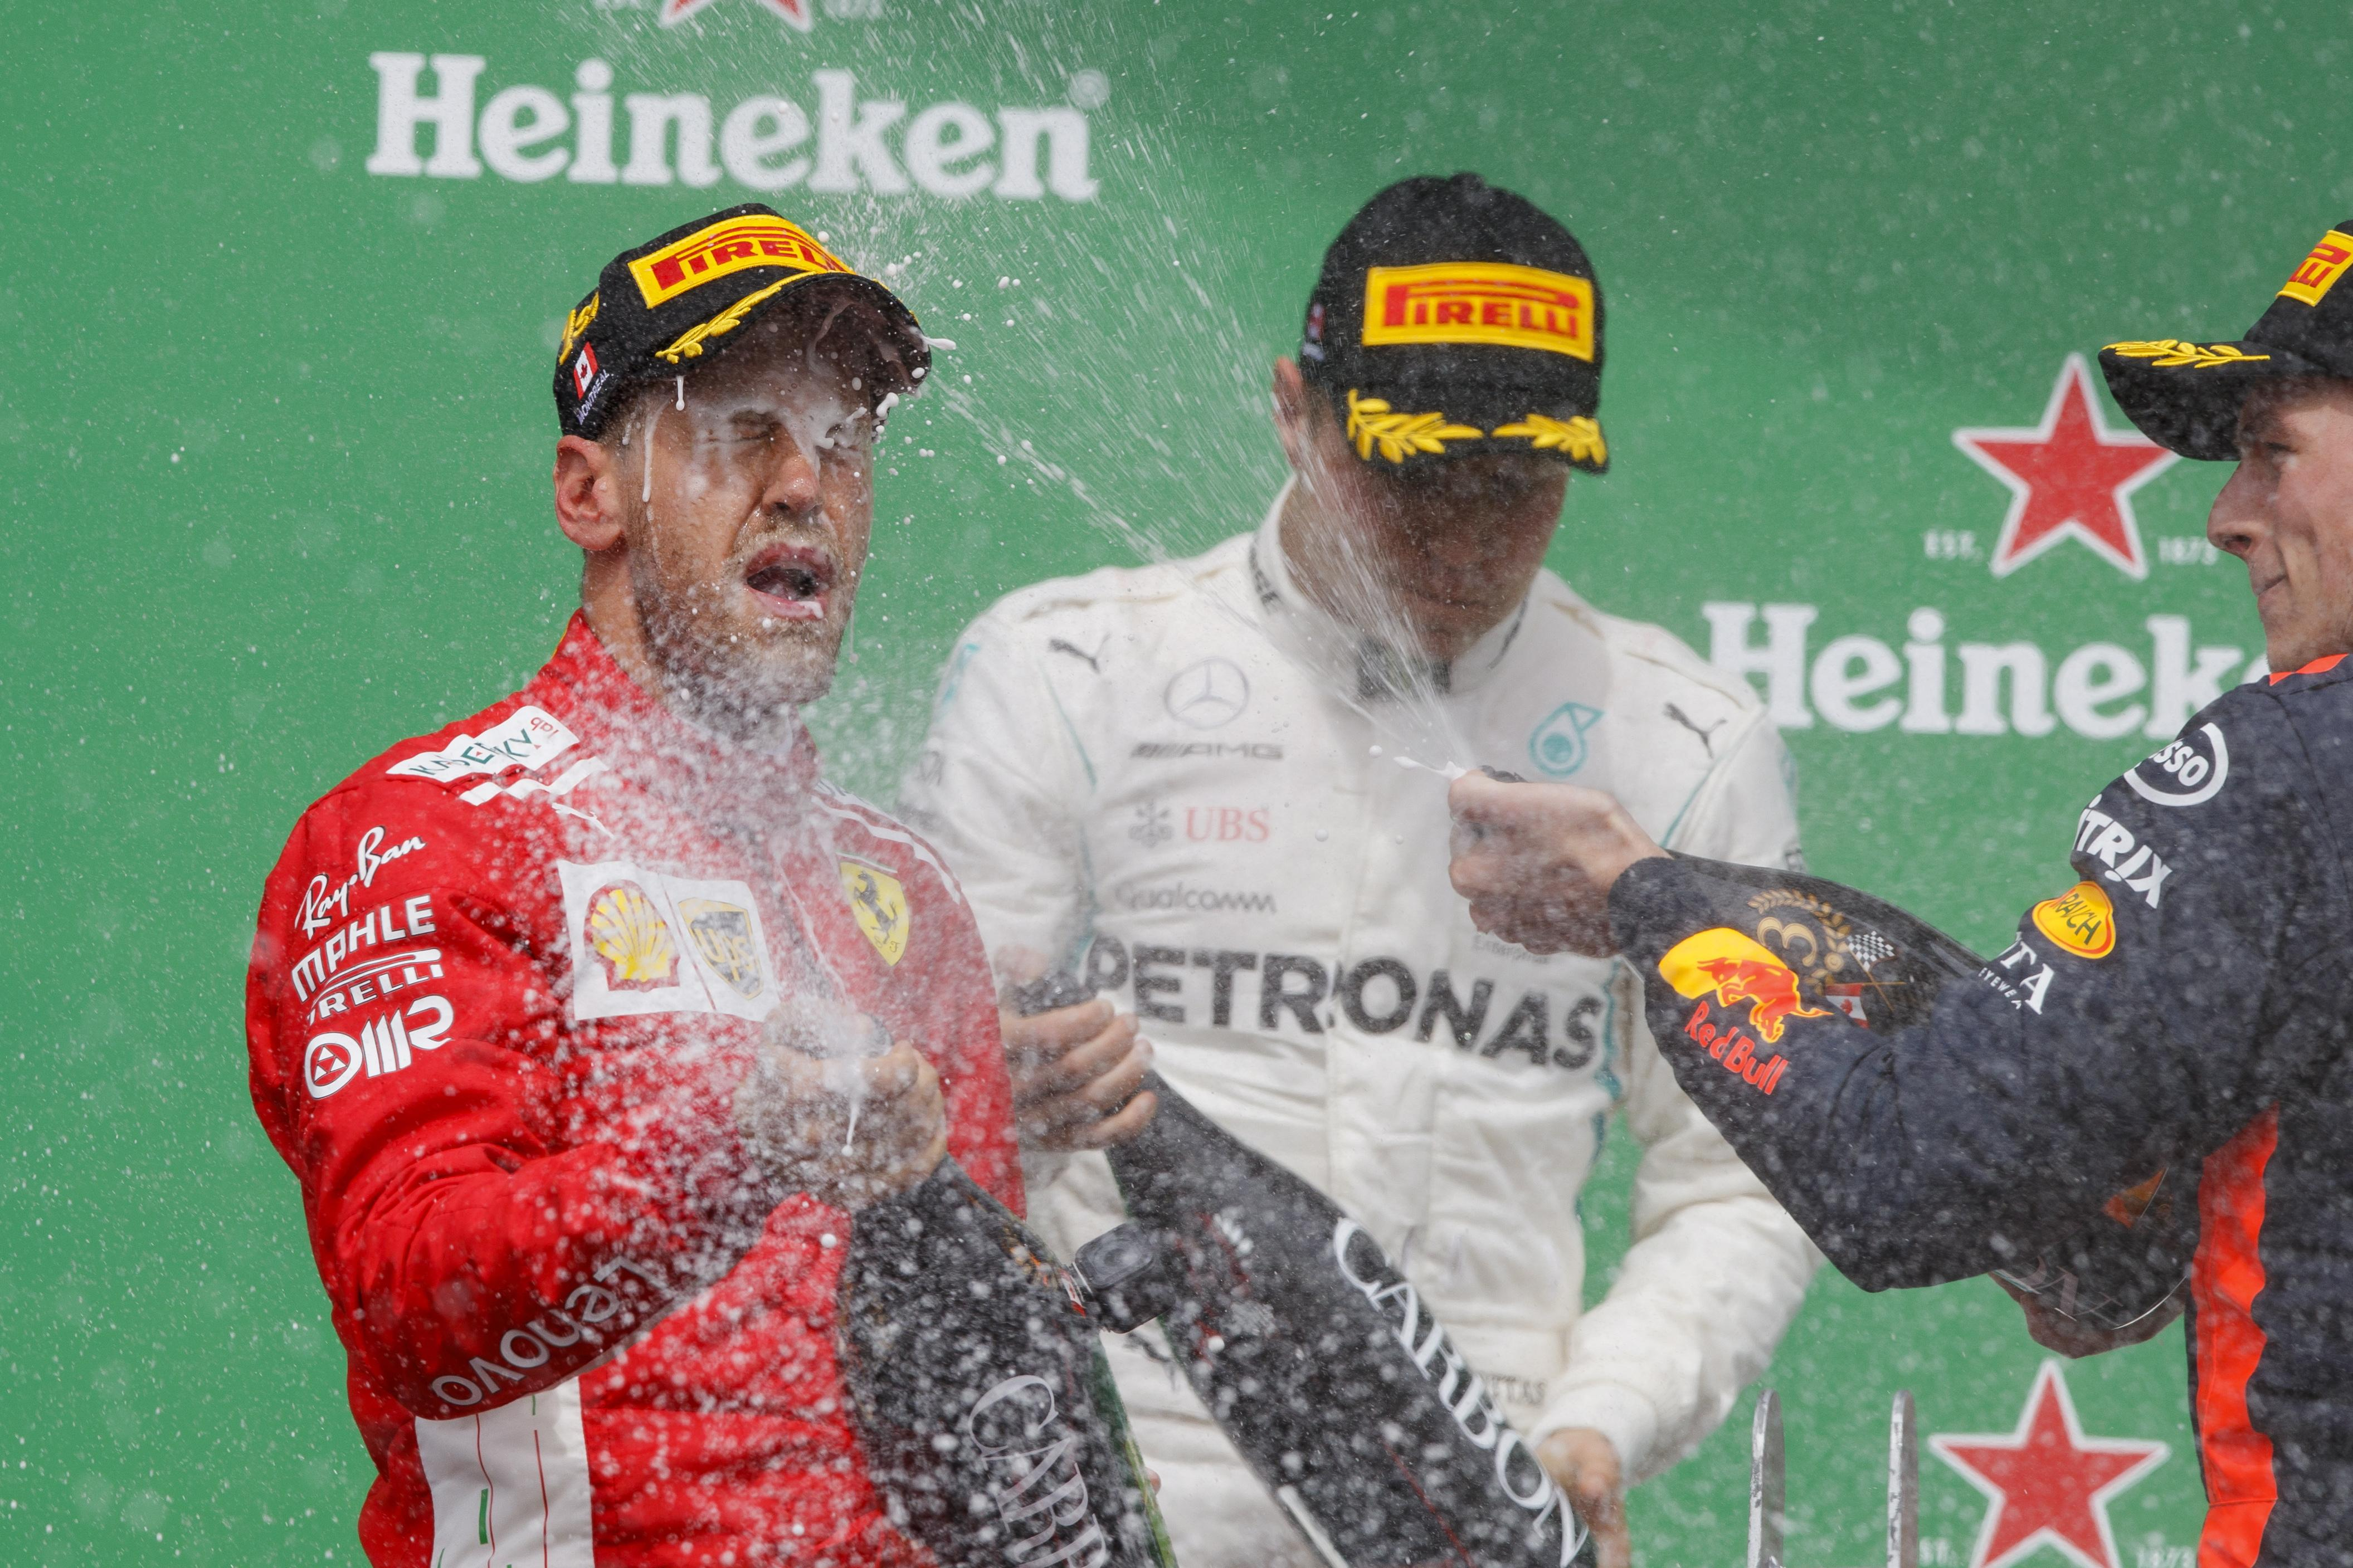 Sebastian Vettel moves one point ahead of Hamilton after winning in Canada